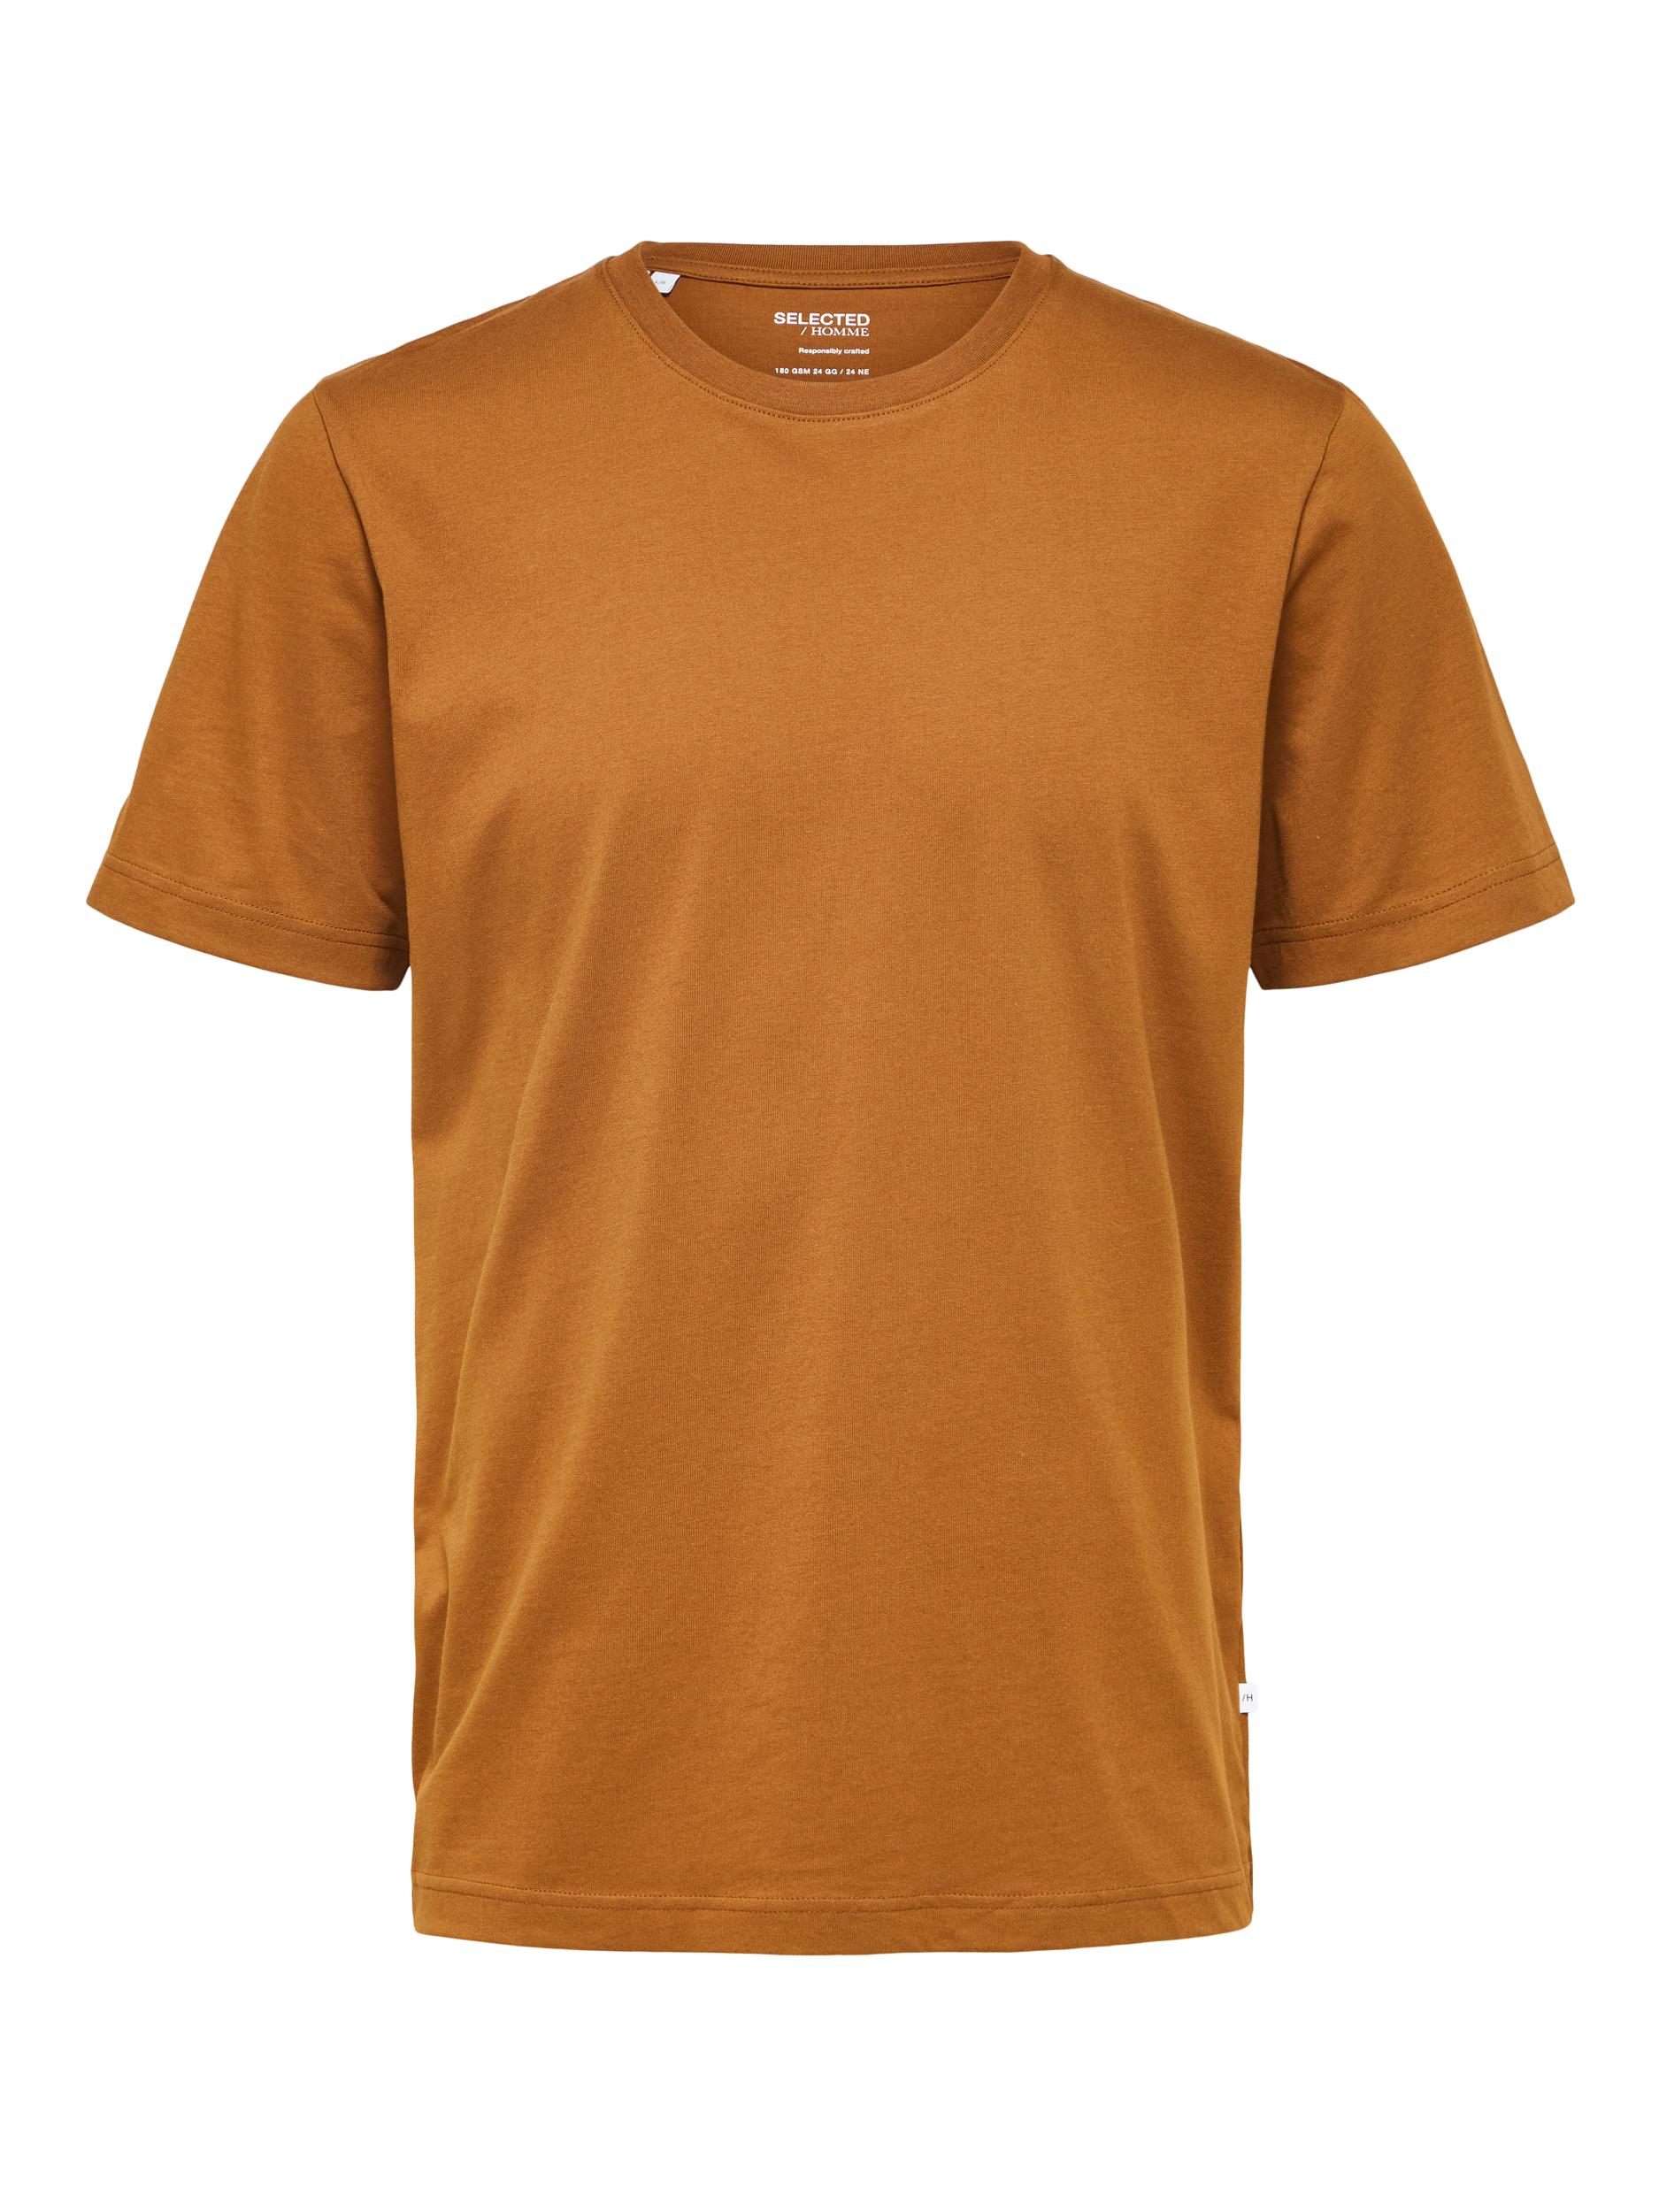 Selected Homme Norman O-Neck t-shirt, monks robe, medium